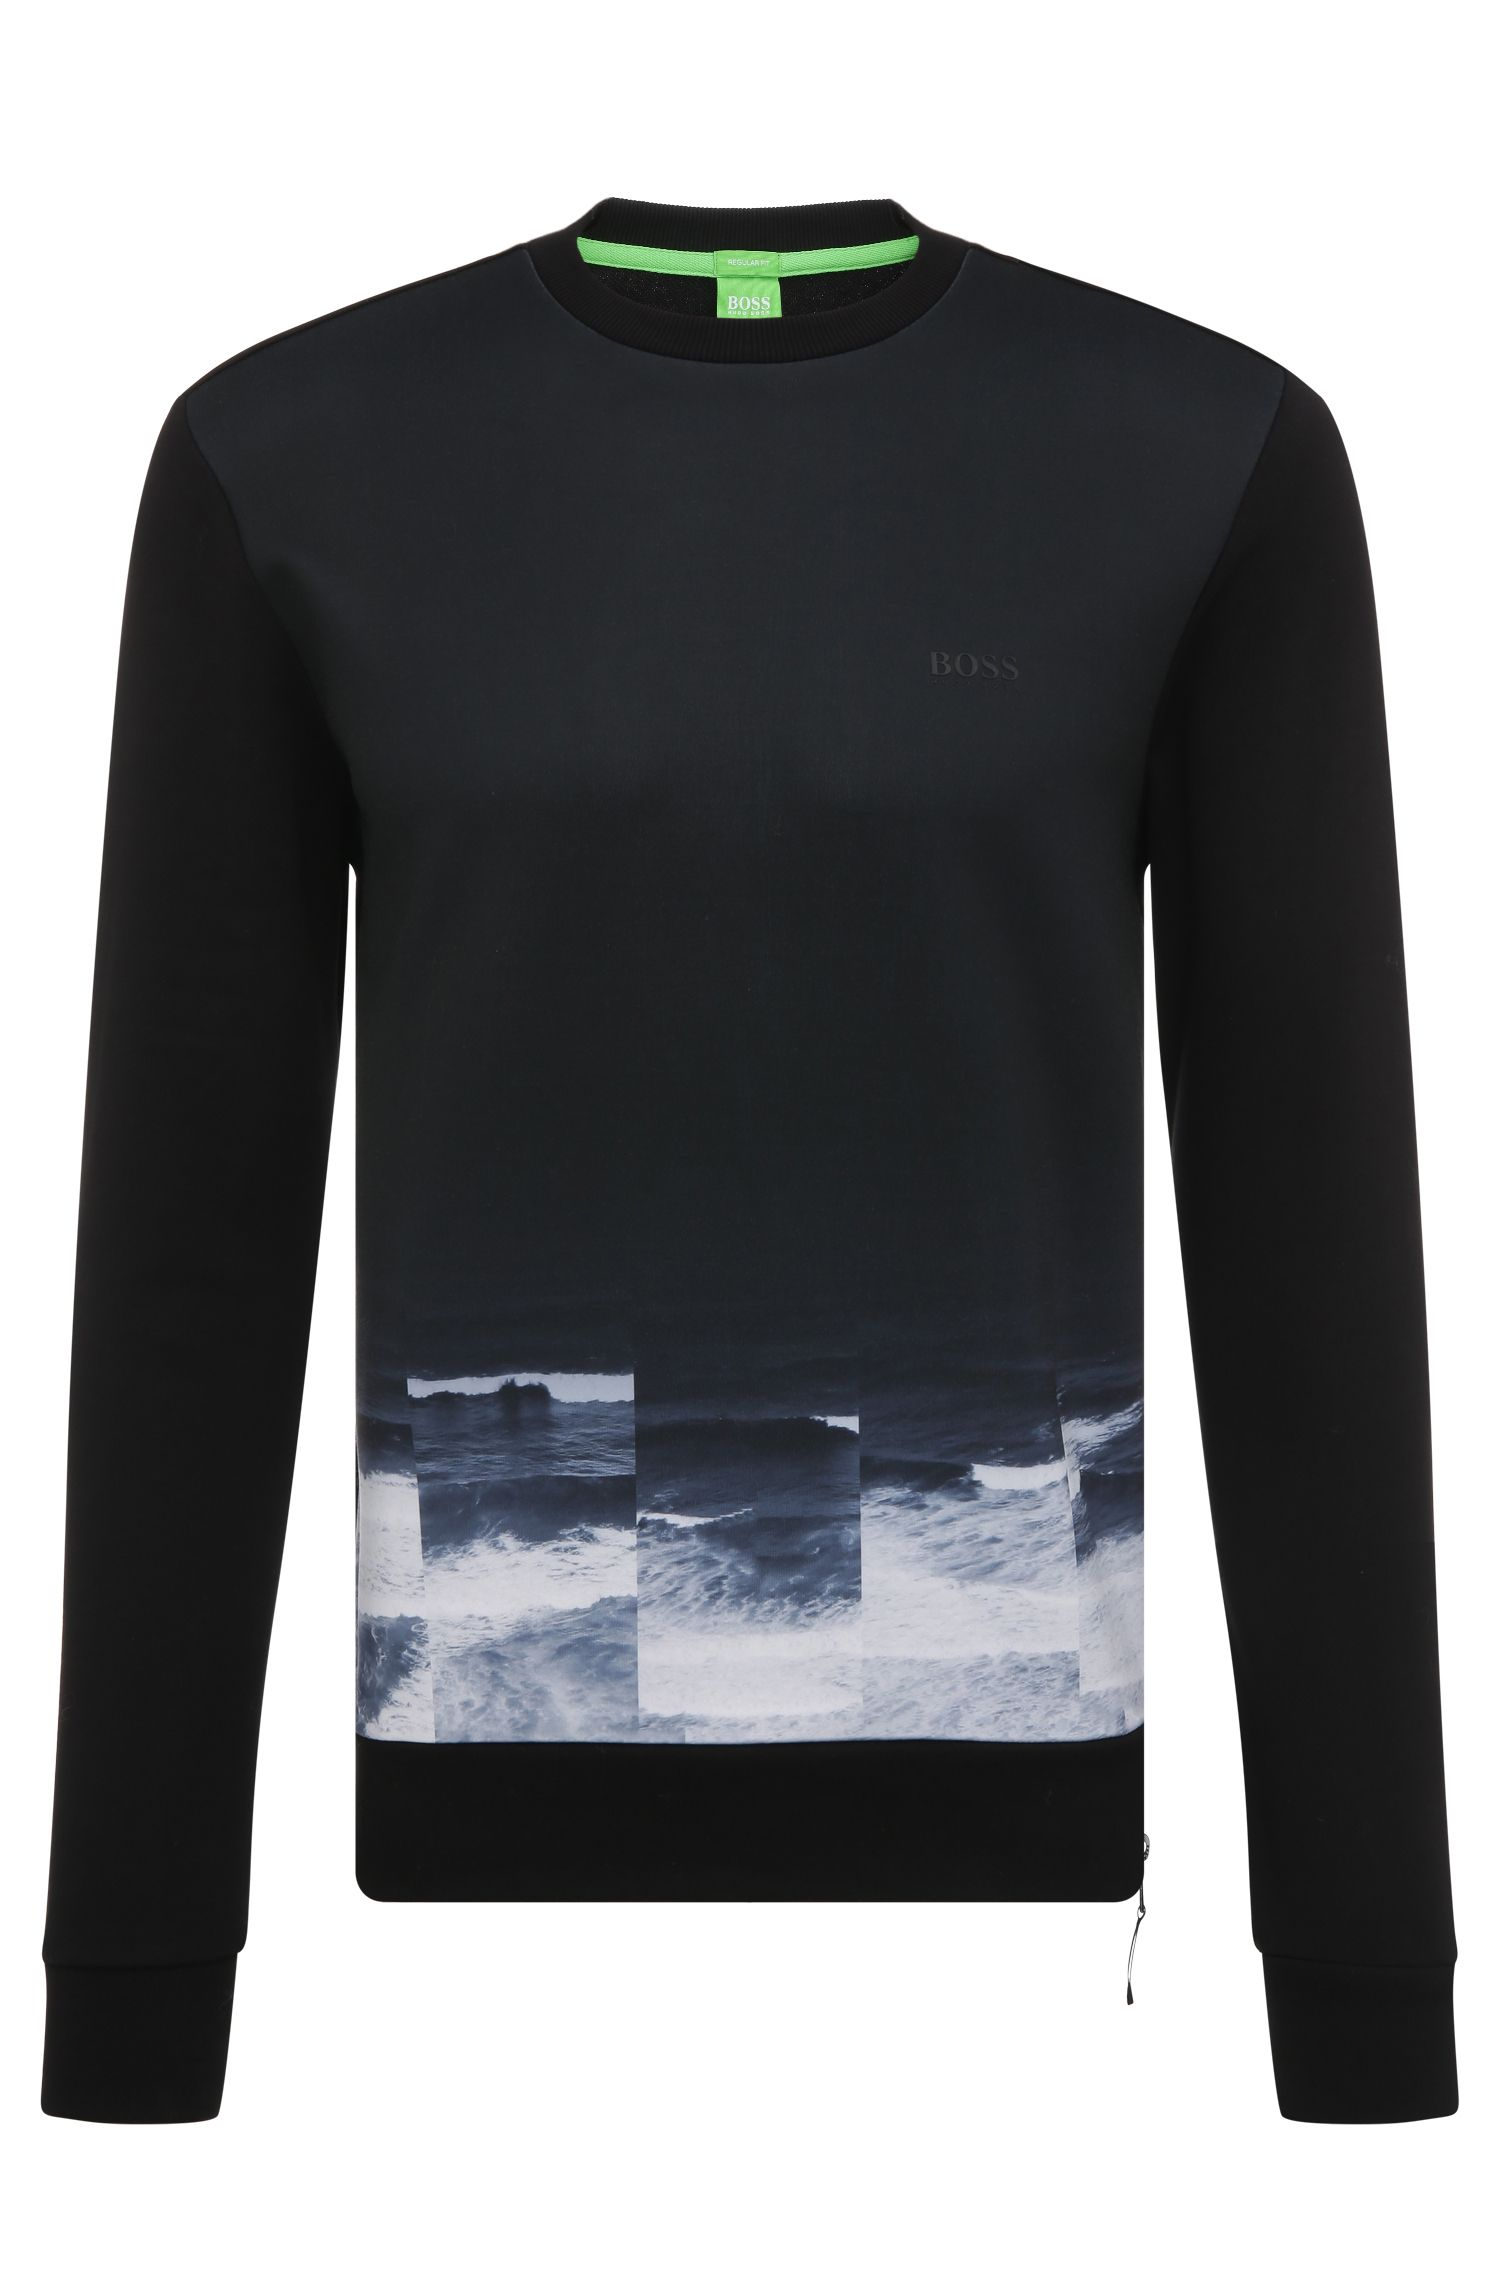 'Salbon' | Cotton Printed Sweatshirt